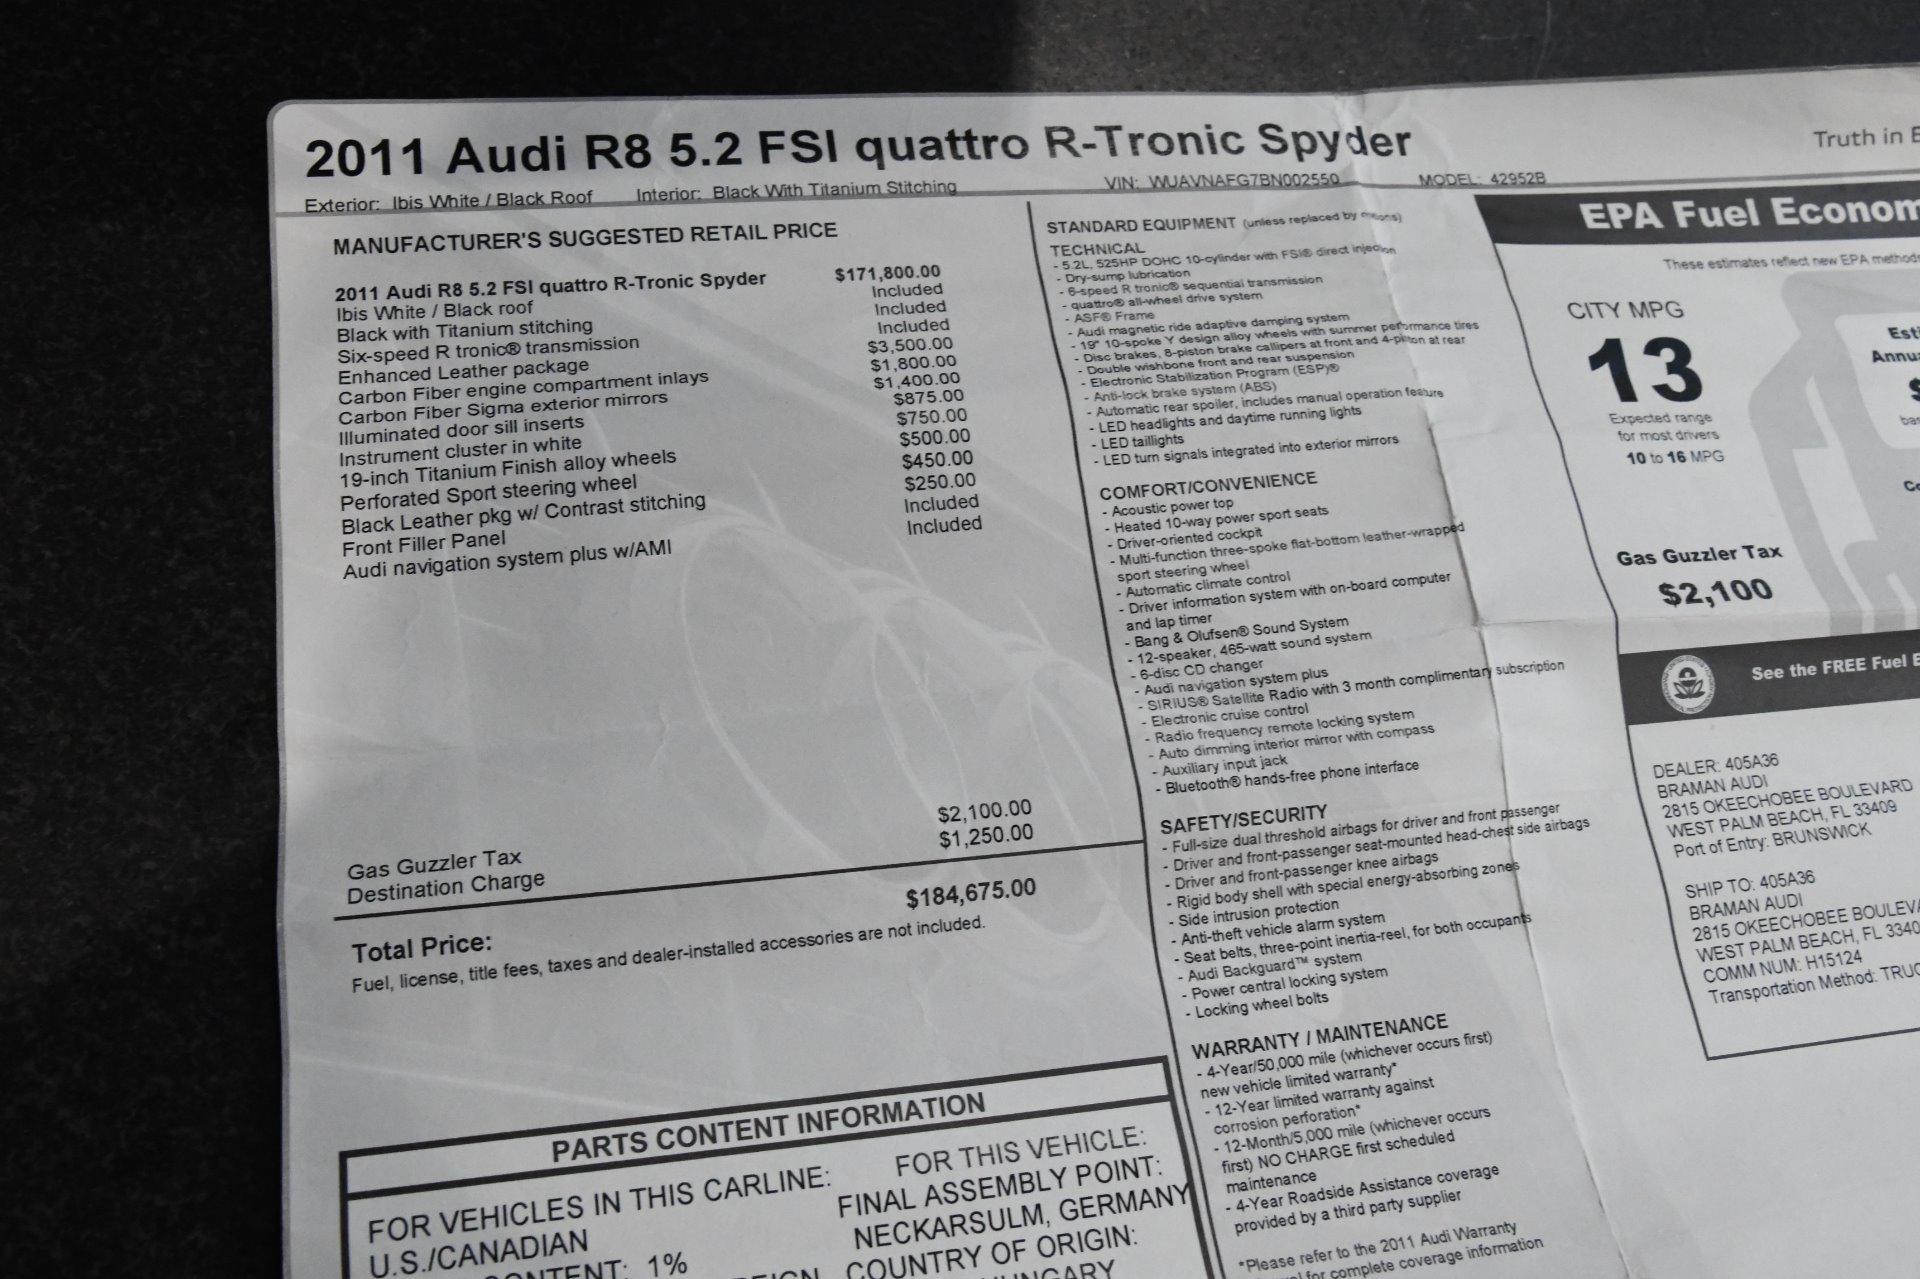 Used 2011 Audi R8 5.2 quattro Spyder | Chicago, IL